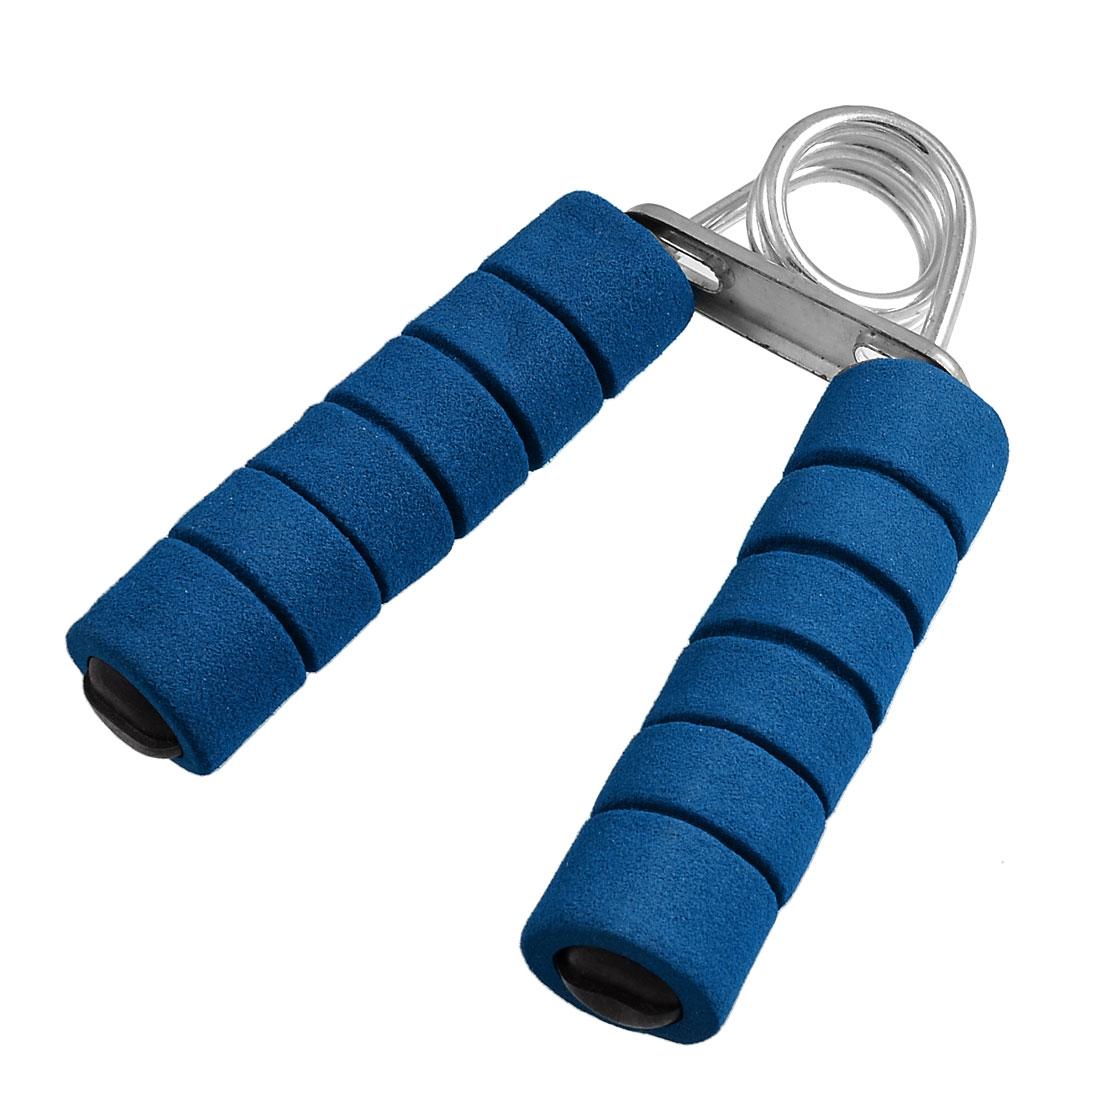 Unique Bargains Slotted Foam Coated Handle Metal Hand Grip Strengthener Fitness Equipment Blue